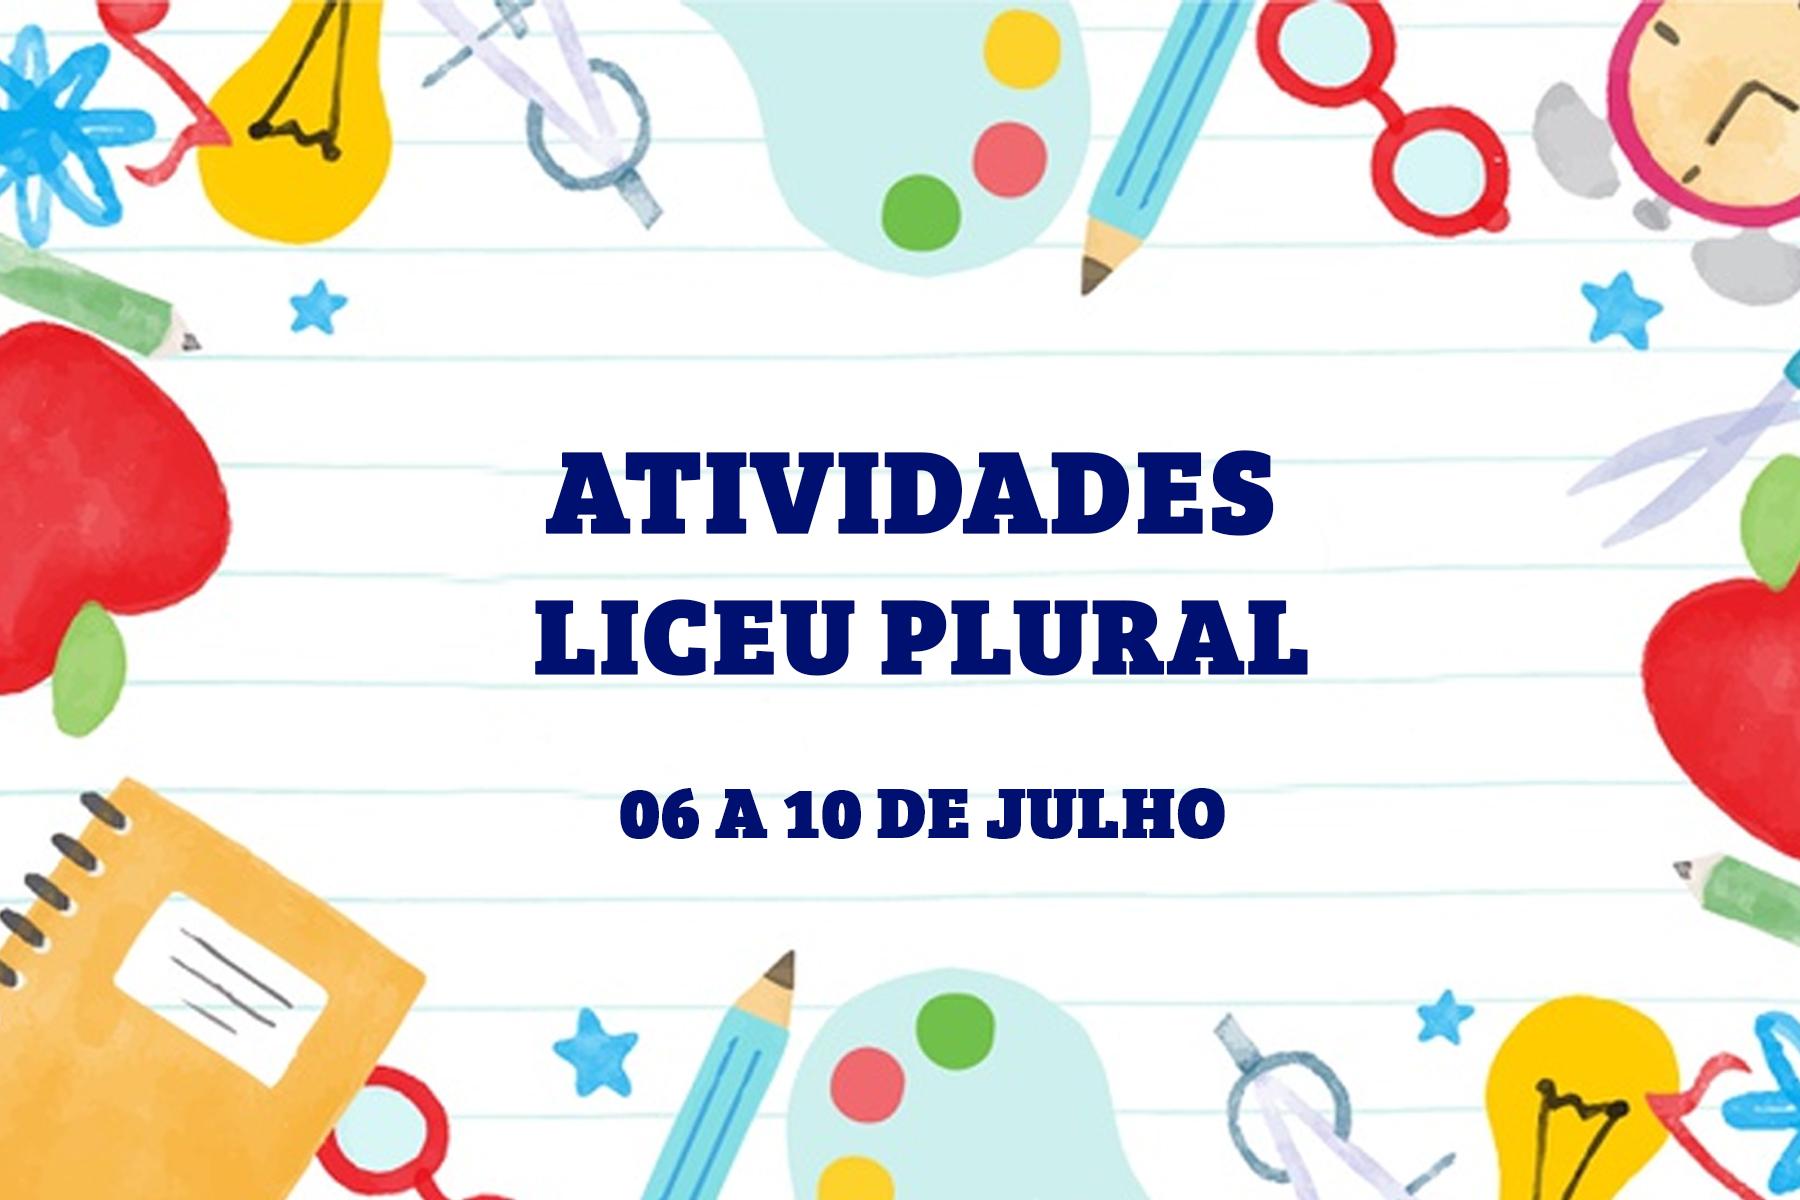 ATIVIDADES | LICEU PLURAL – 06 A 10 DE JULHO